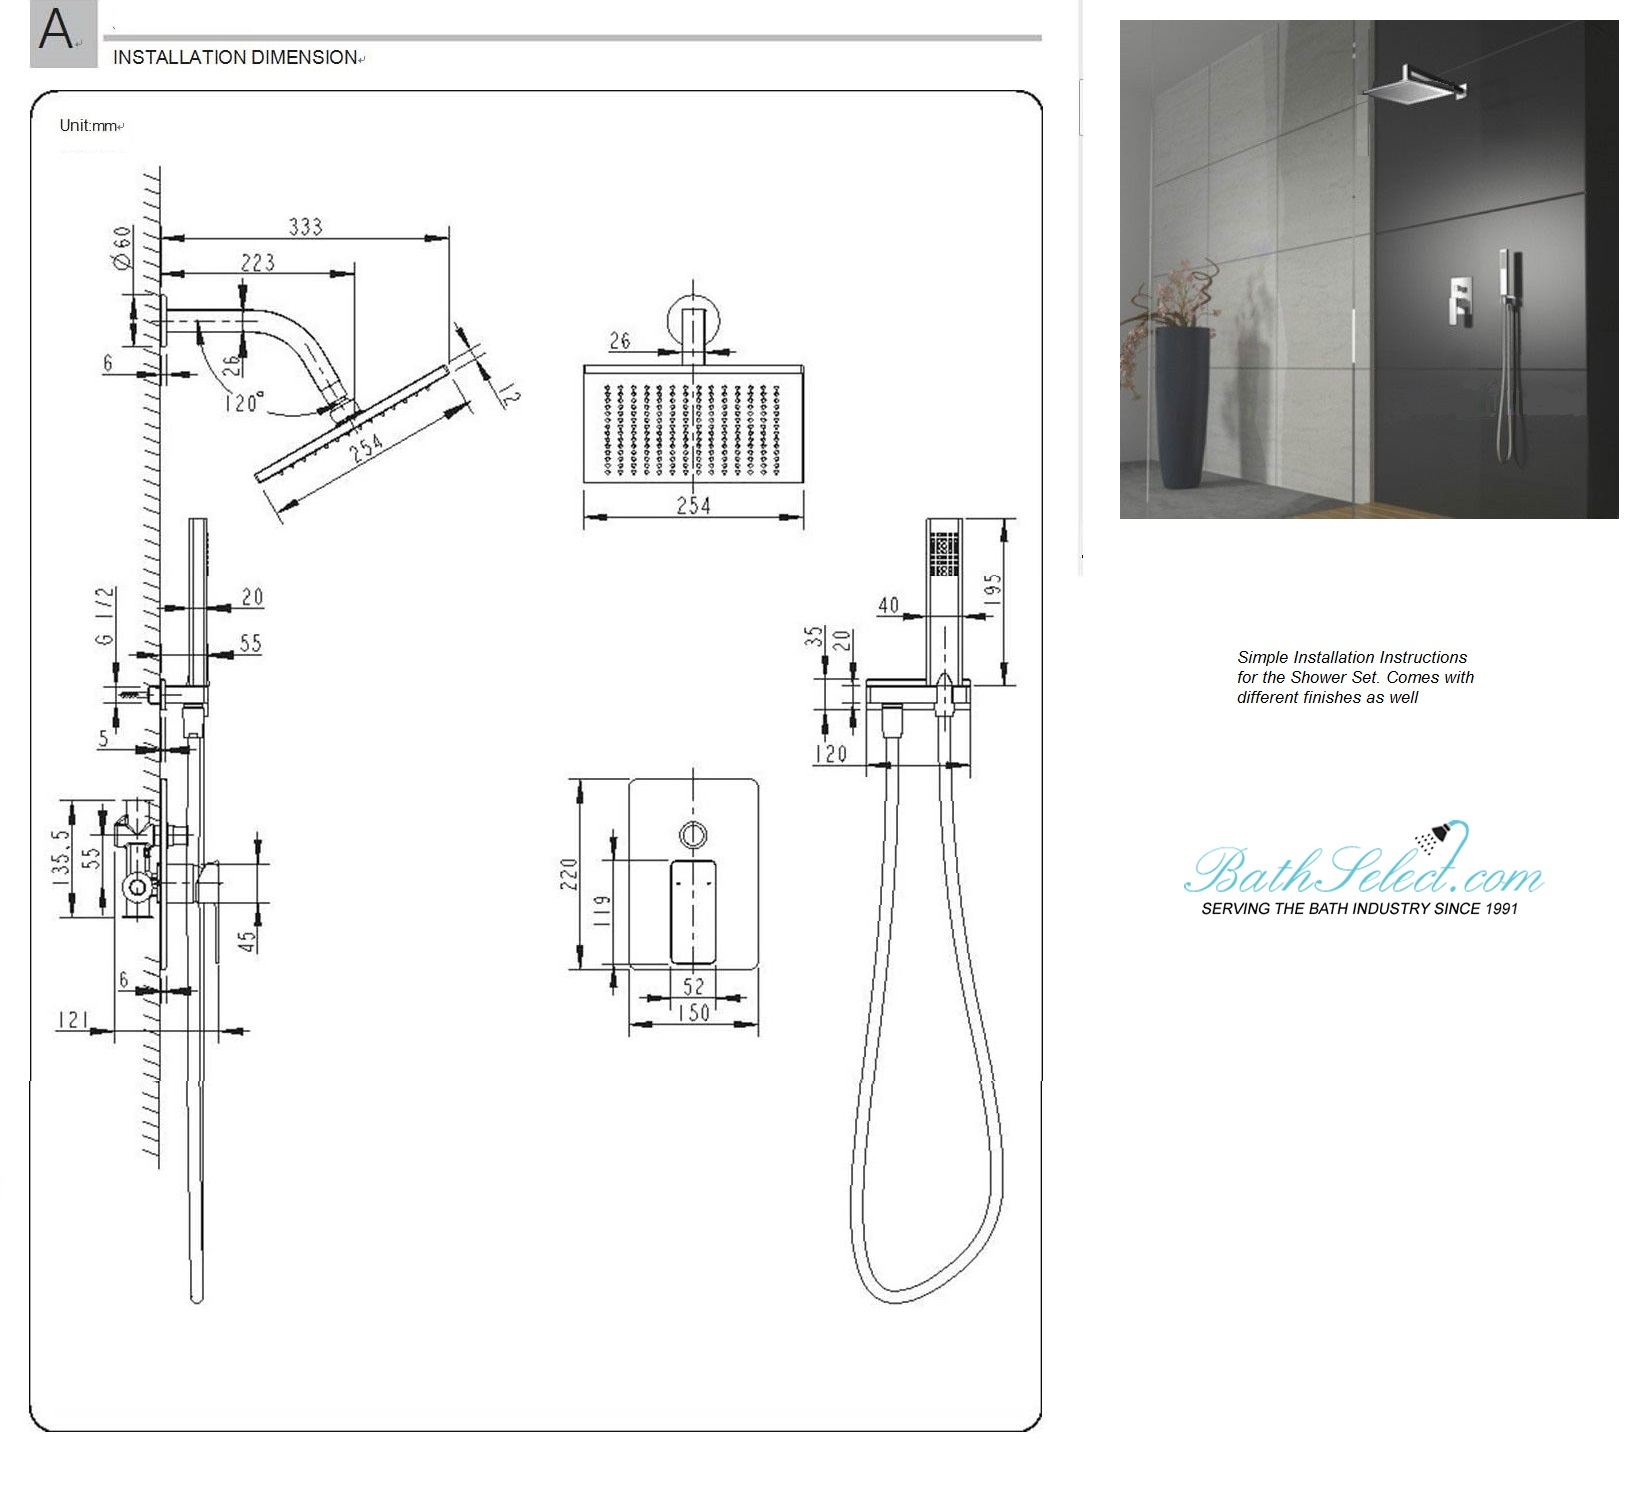 shower mixer installation instructions